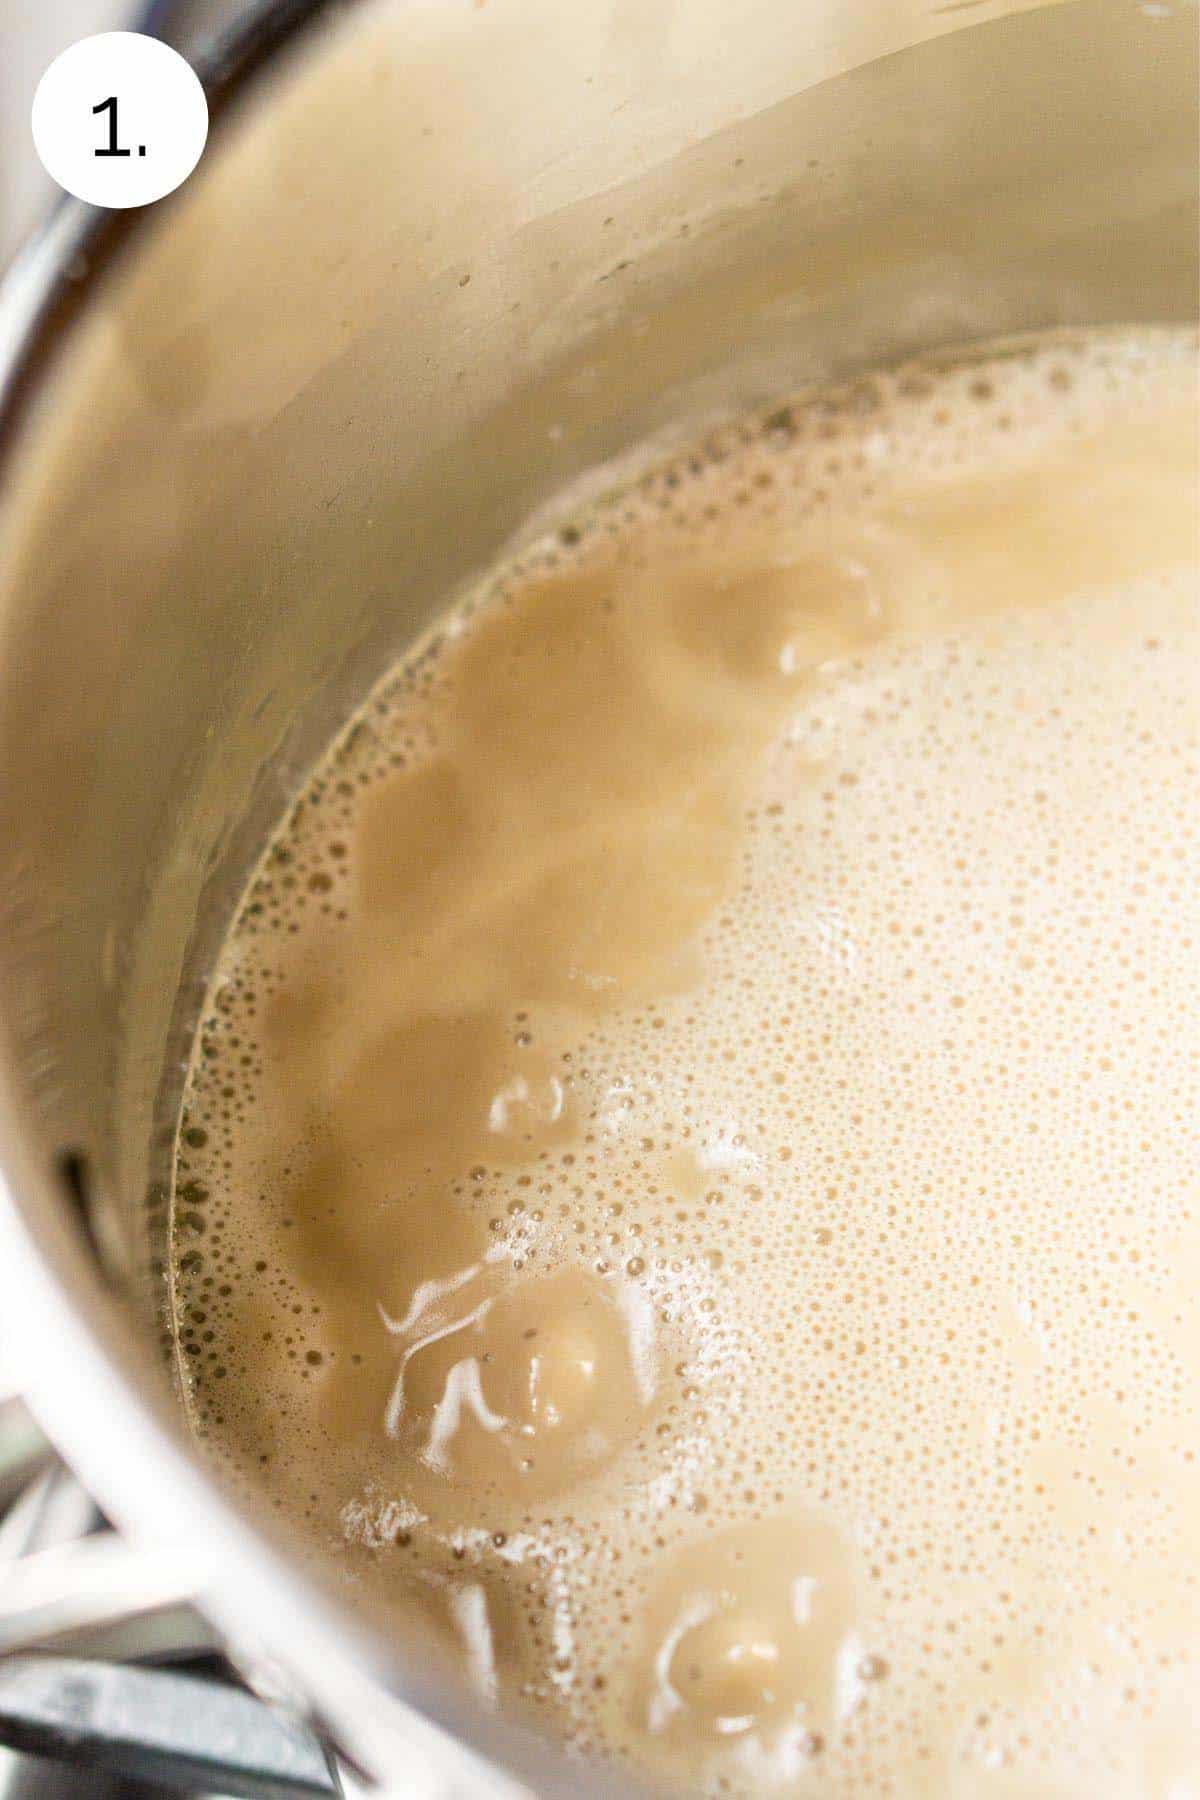 Simmering the heavy cream, milk and brown sugar in a medium saucepan.